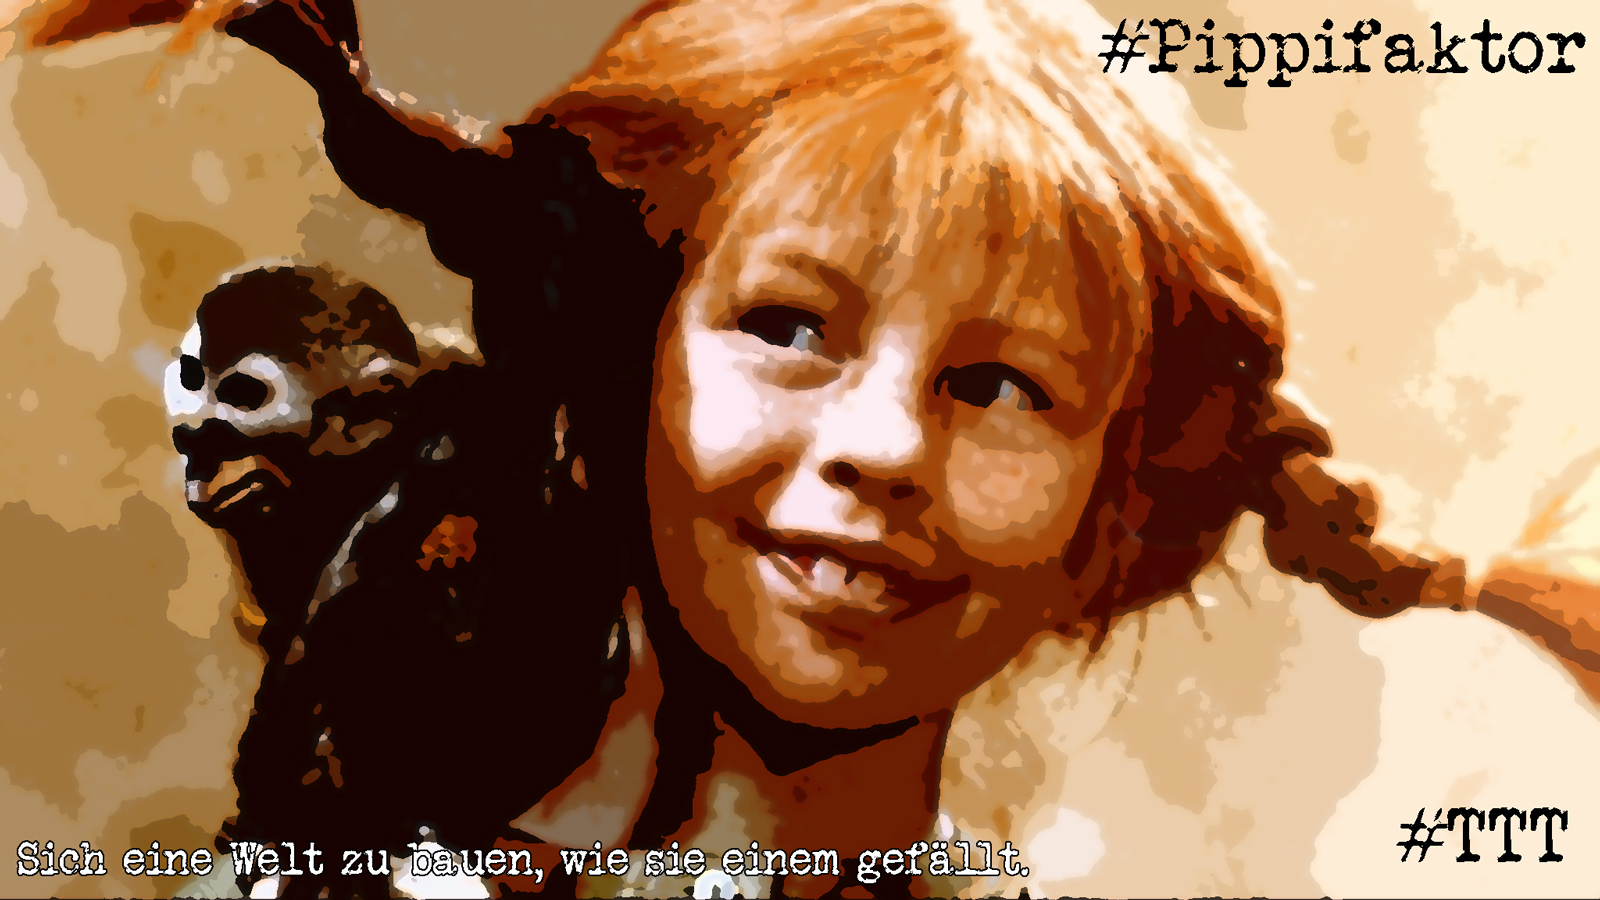 Pippifaktor_TTT